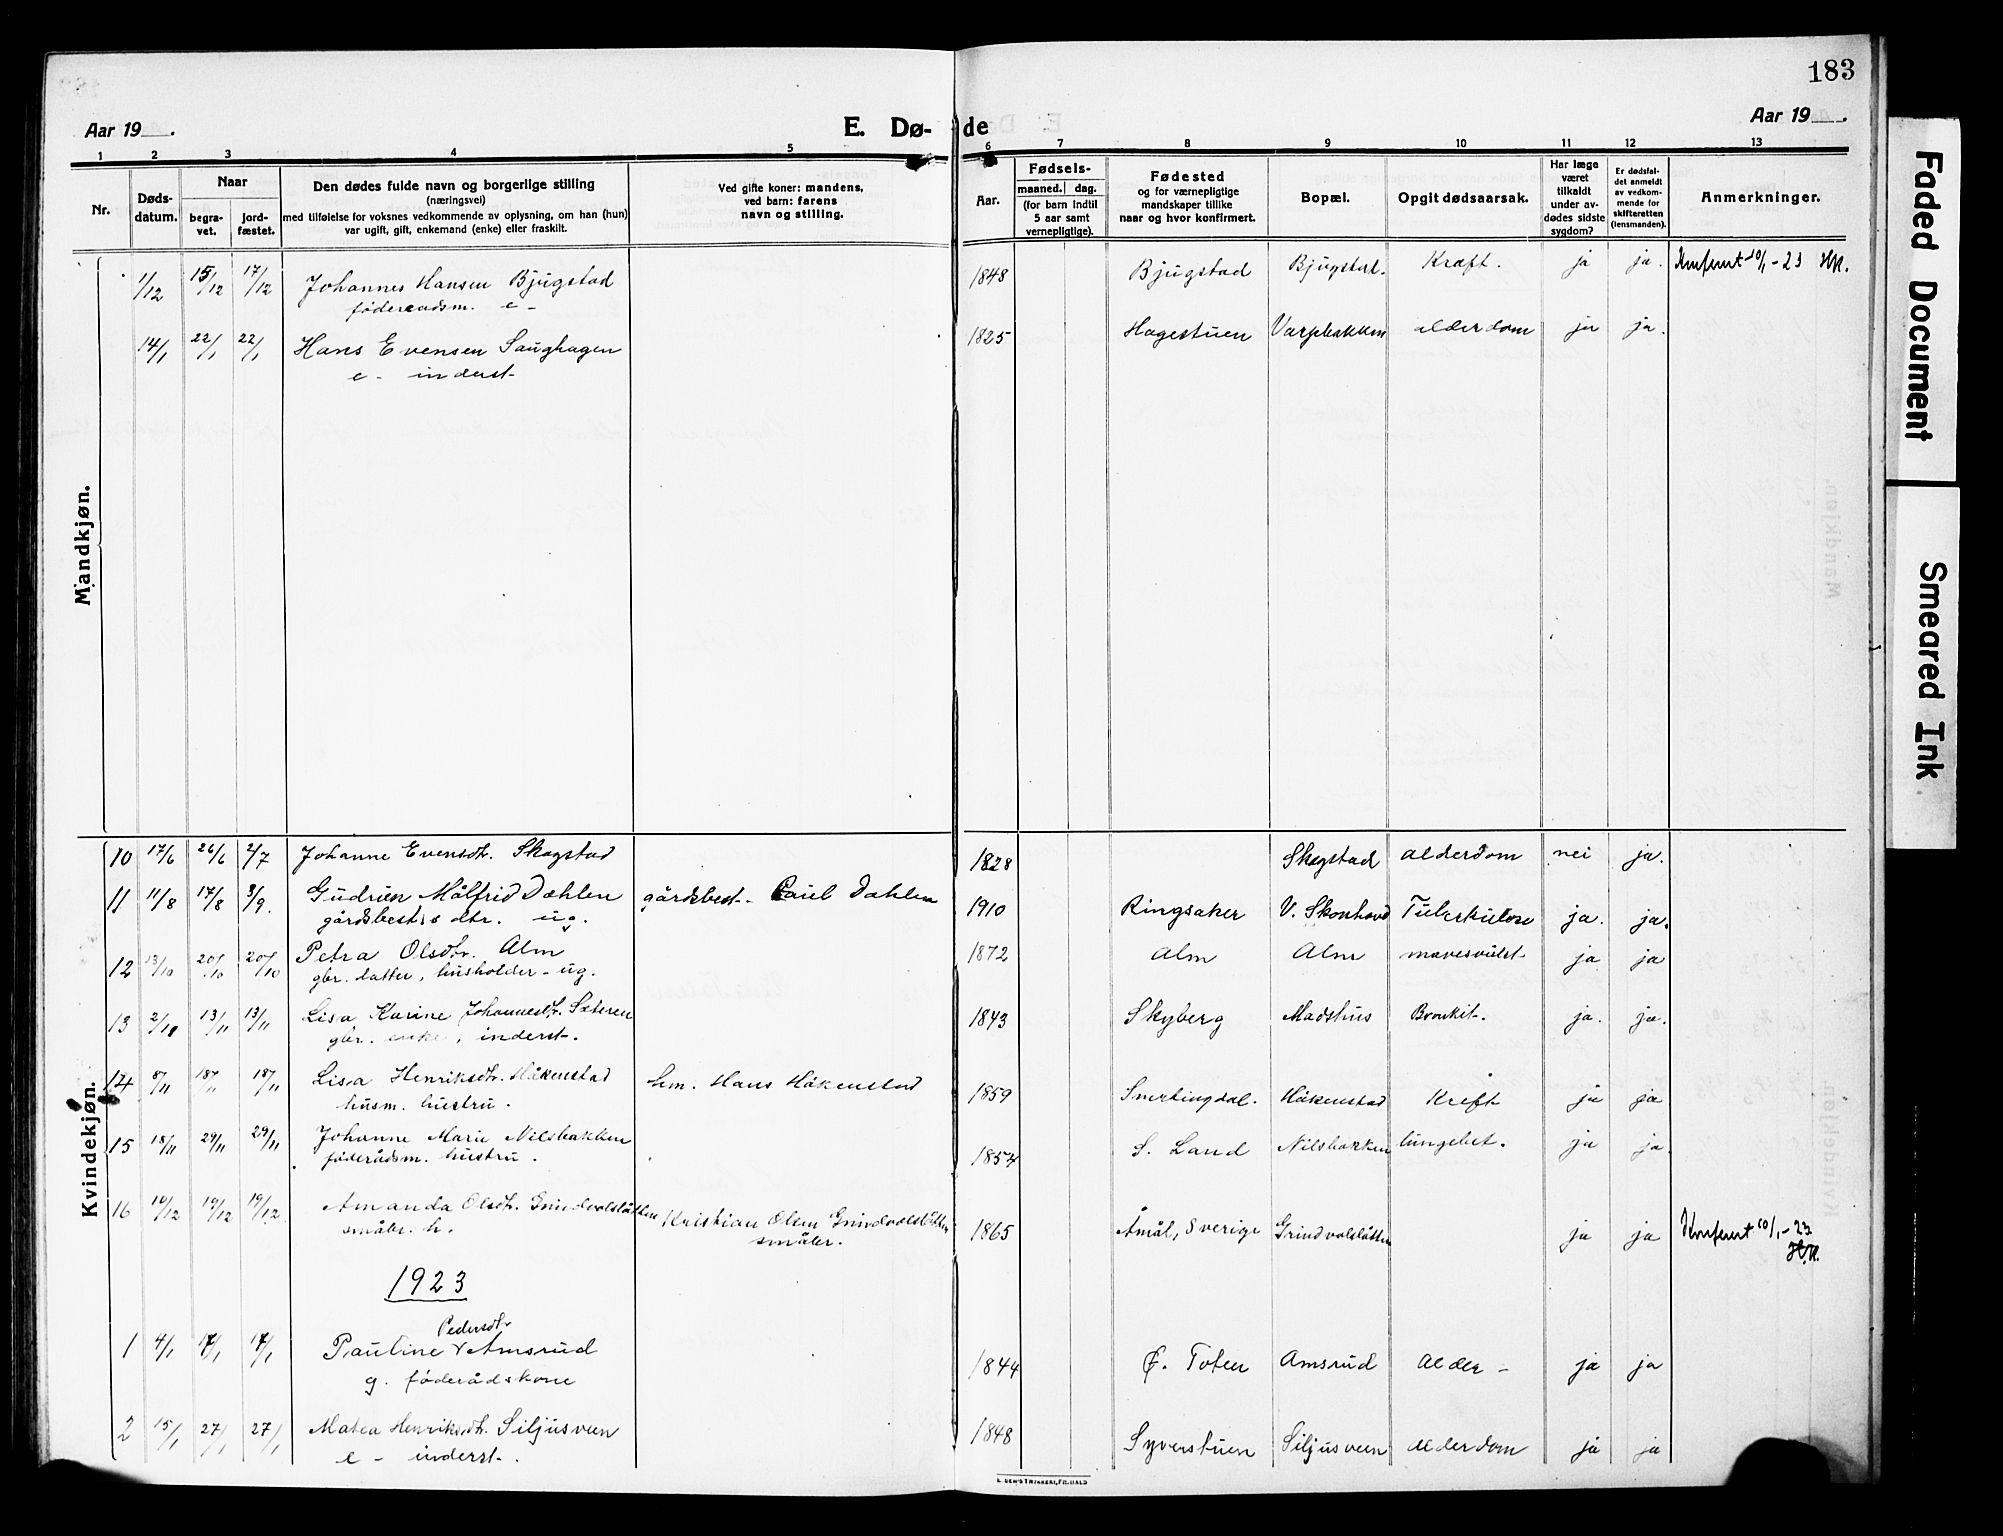 SAH, Vardal prestekontor, H/Ha/Hab/L0015: Klokkerbok nr. 15, 1914-1931, s. 183